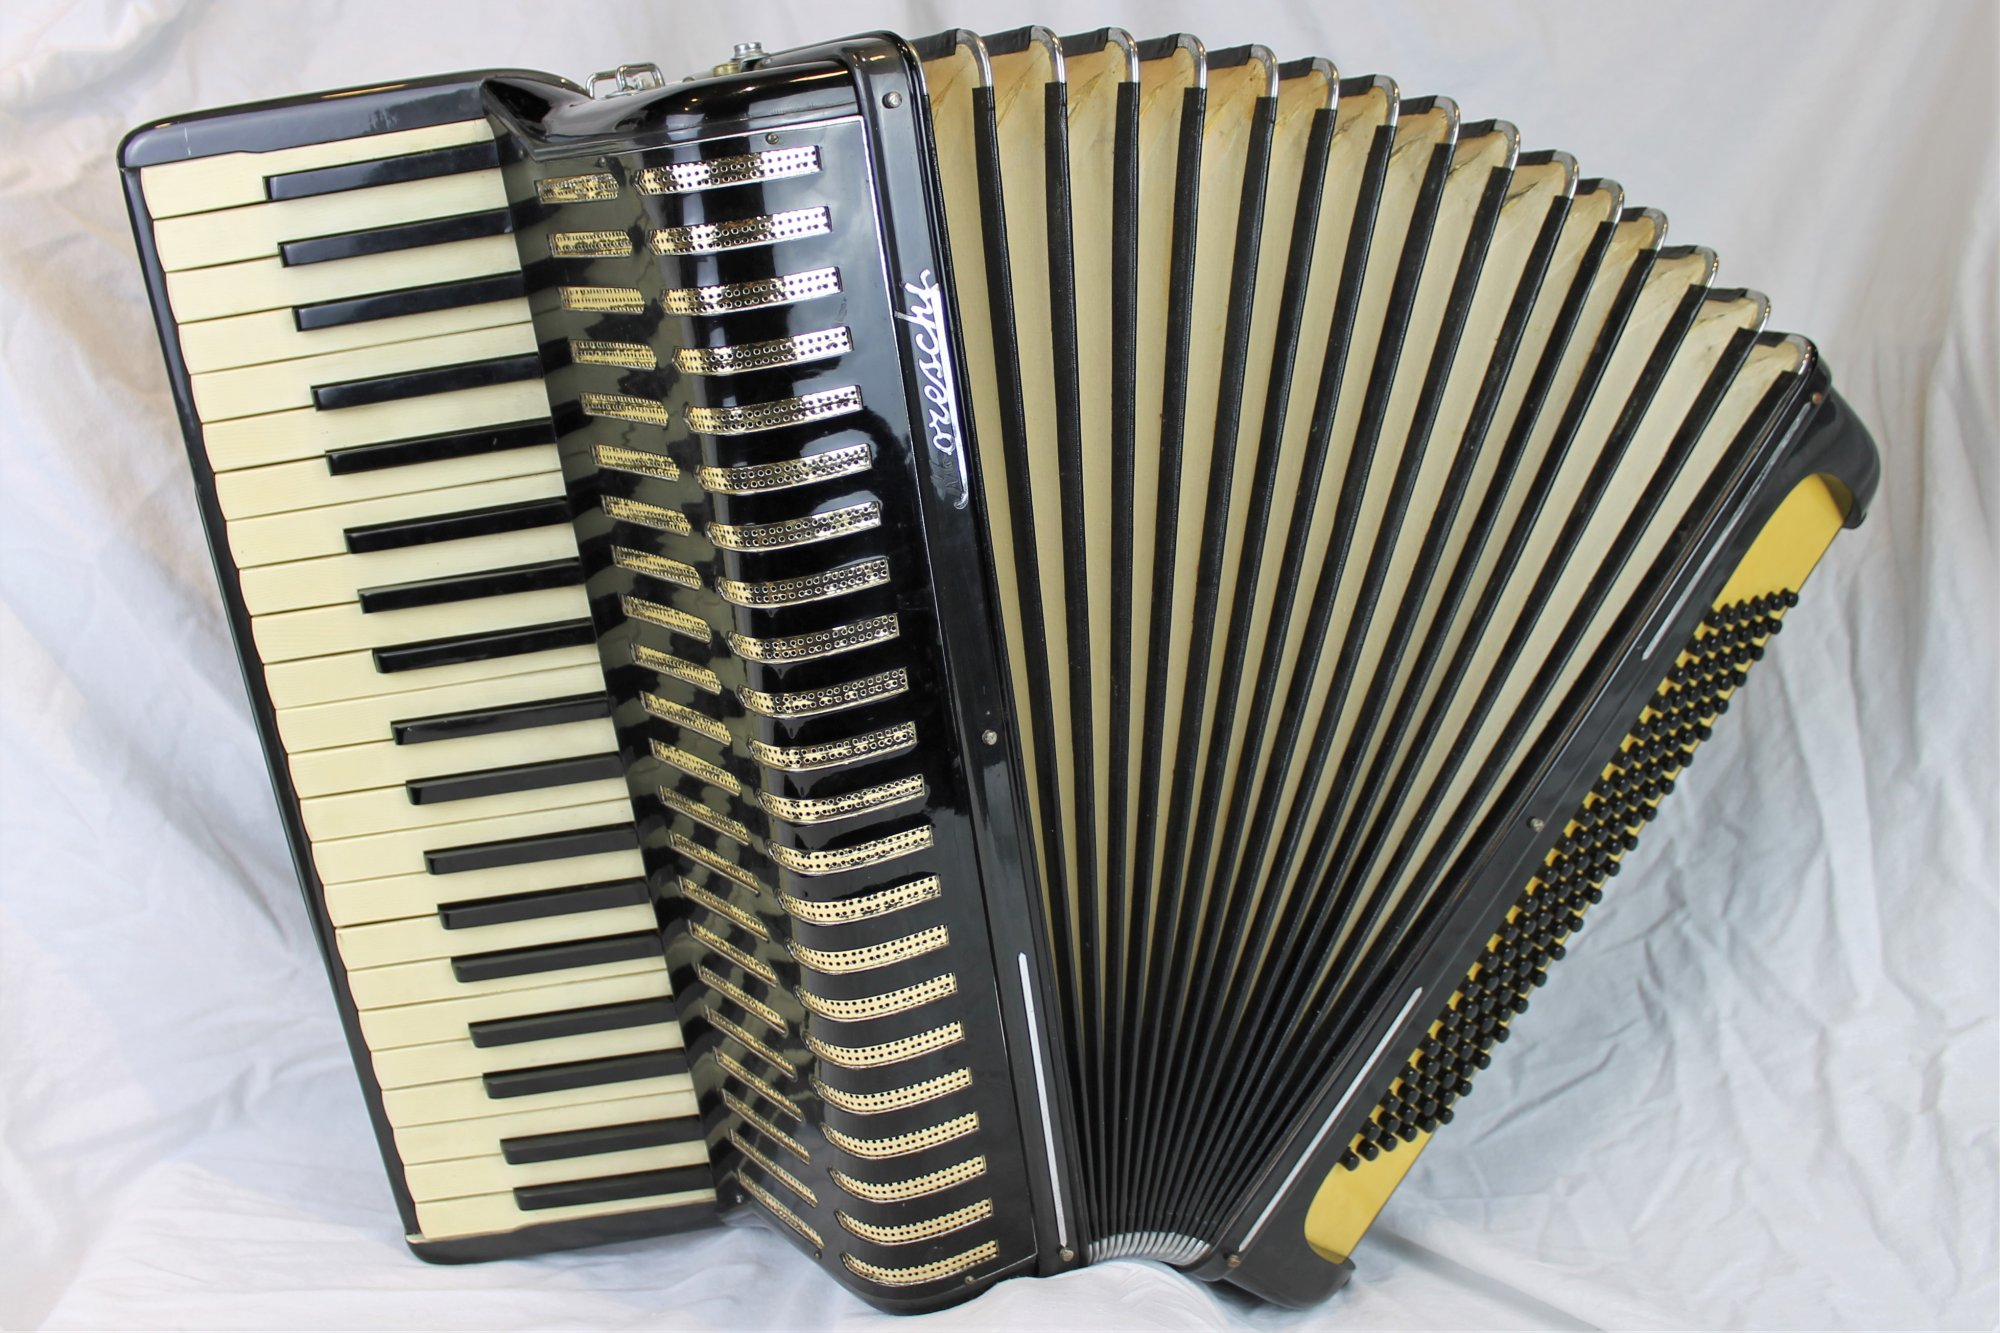 4401 - Black Moreschi Piano Accordion LMM 41 120